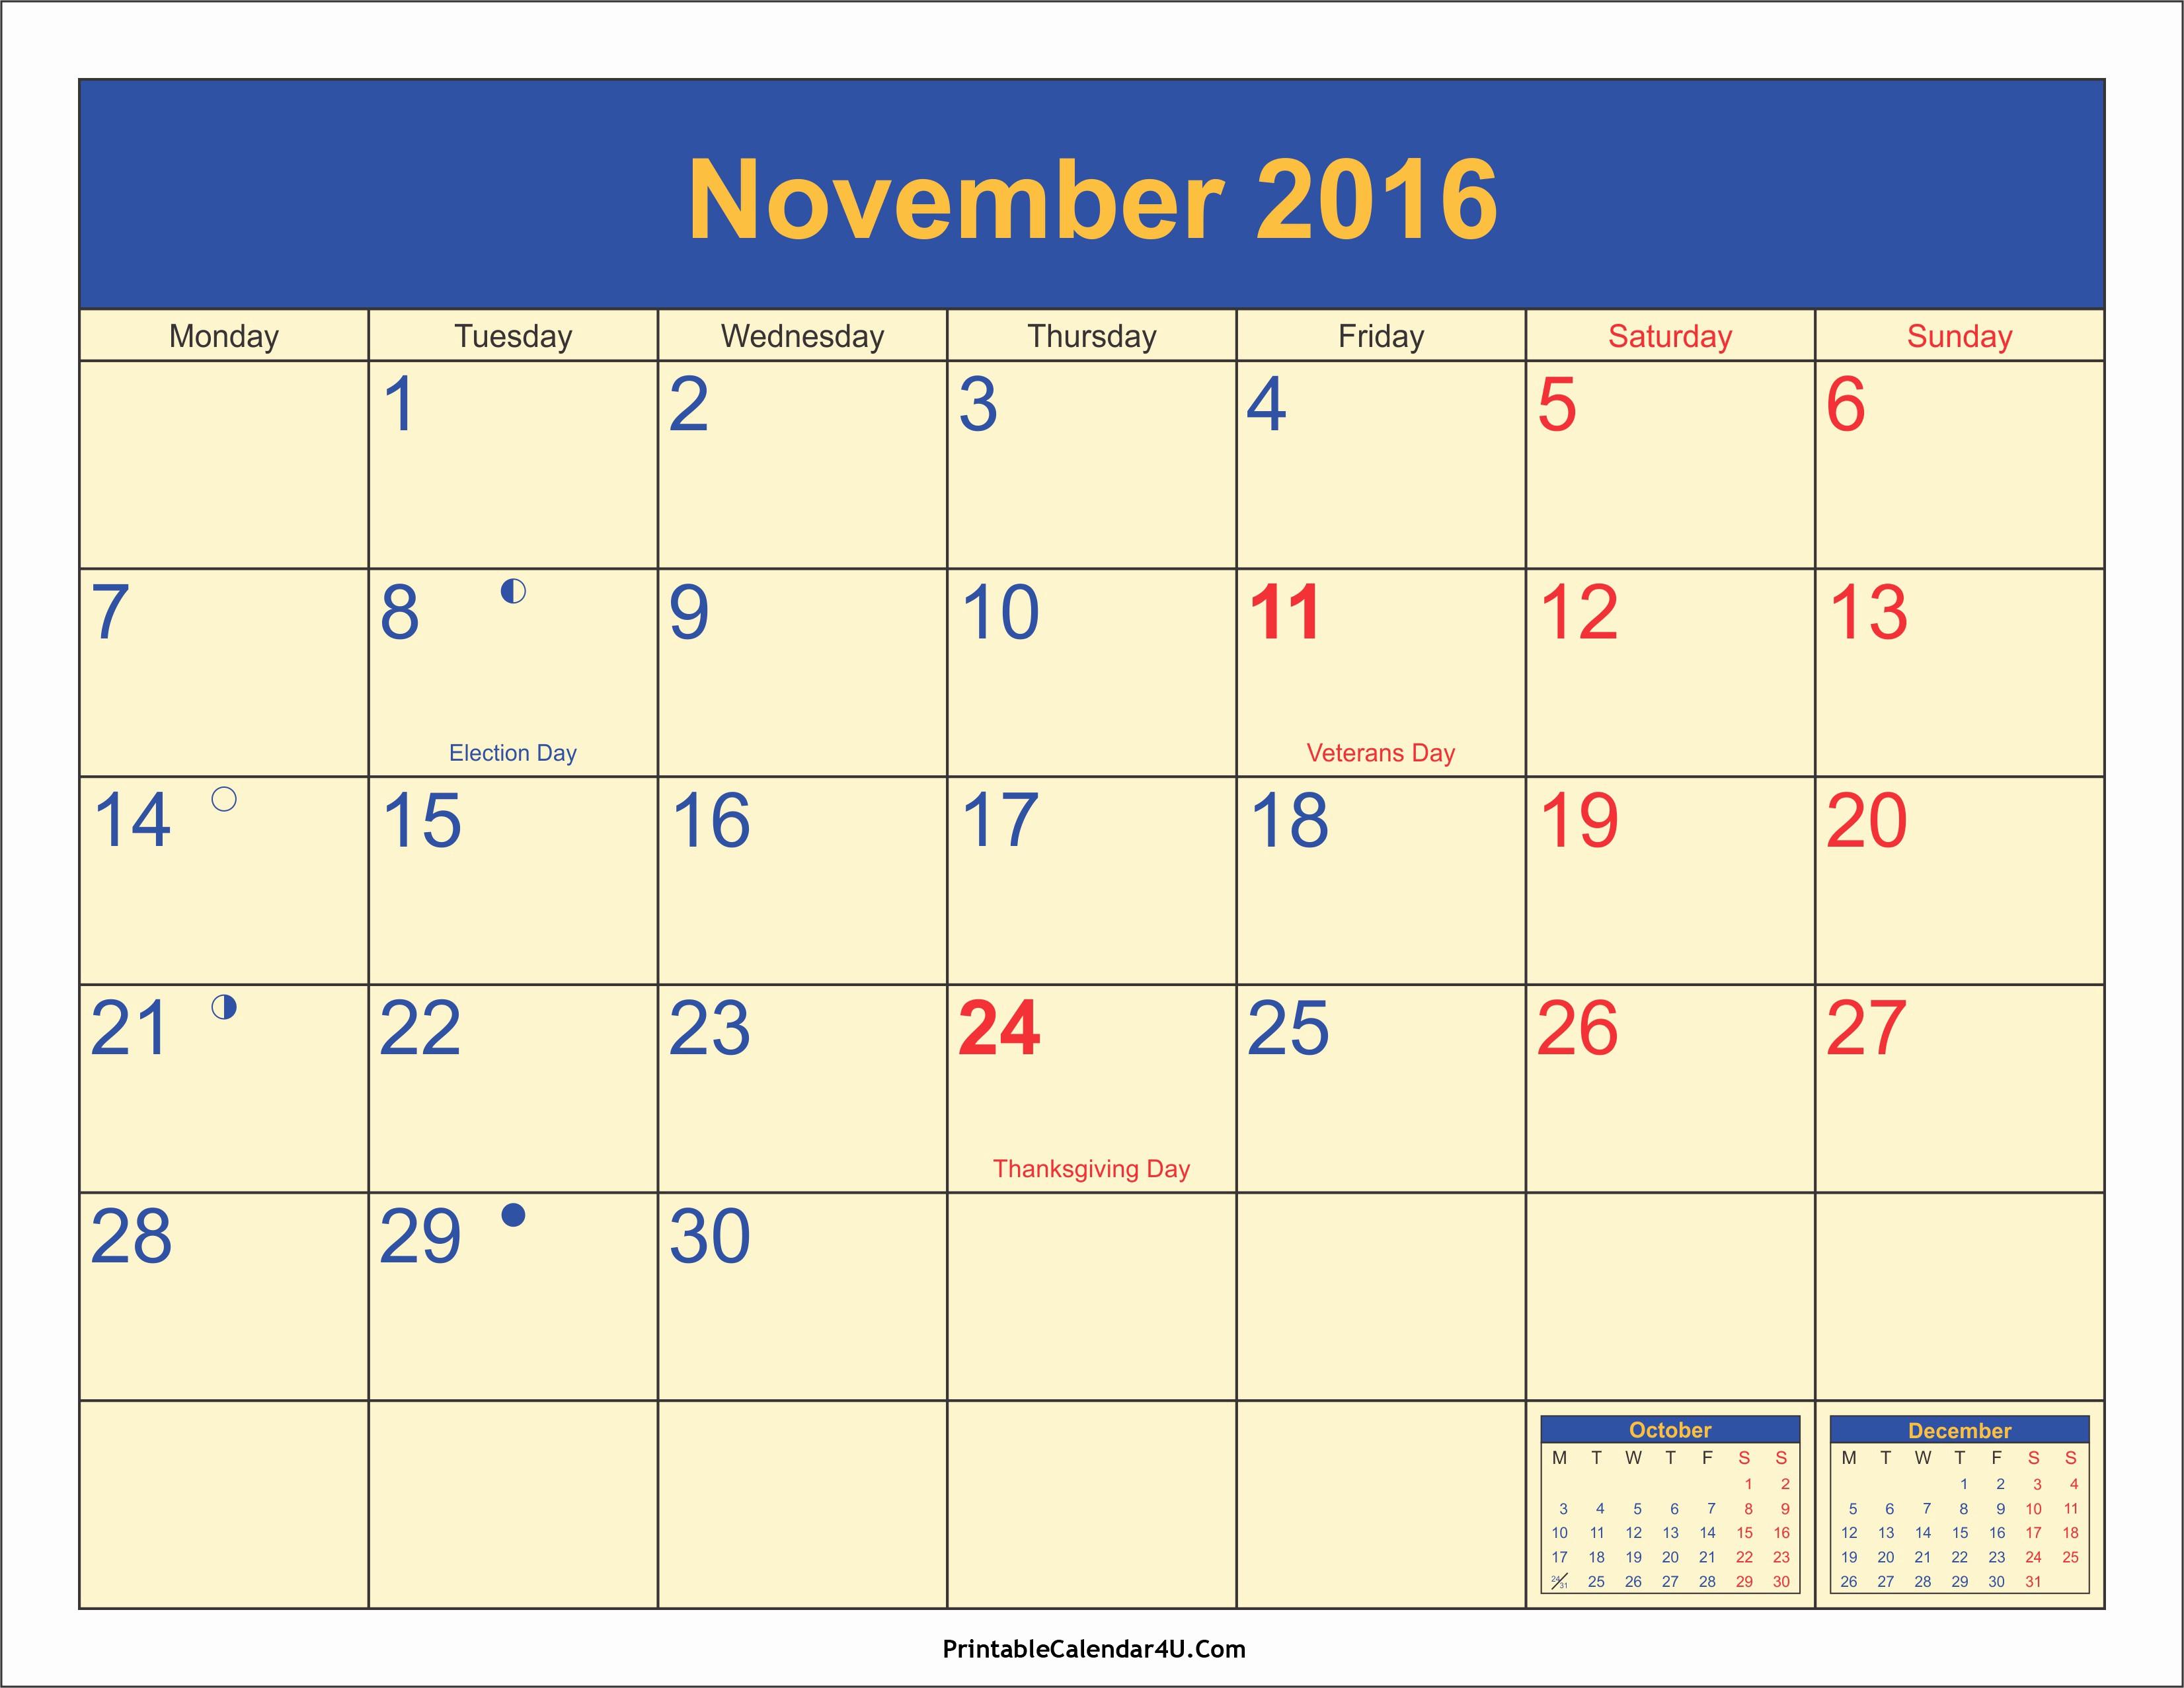 Calendar 2016 Printable with Holidays Inspirational November 2016 Calendar Printable with Holidays Pdf and Jpg